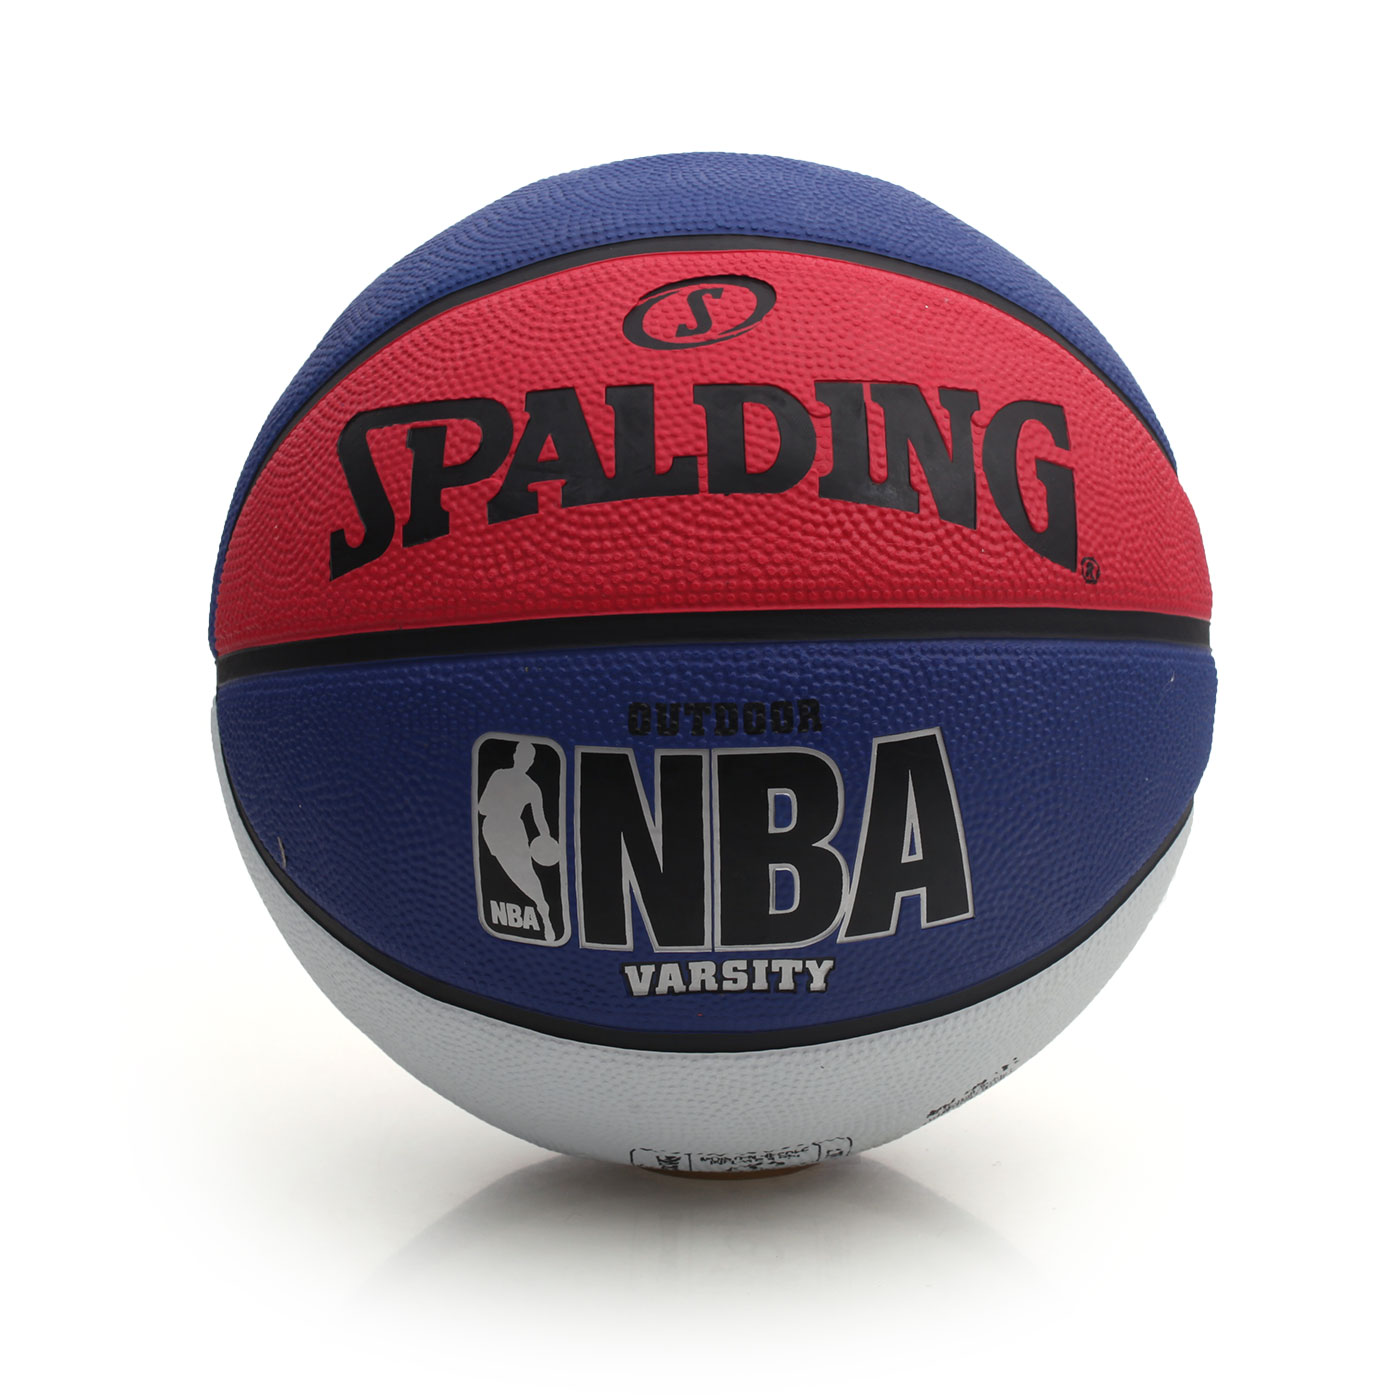 SPALDING NBA Varsity 斯伯丁籃球 SPA83275 - 白藍紅